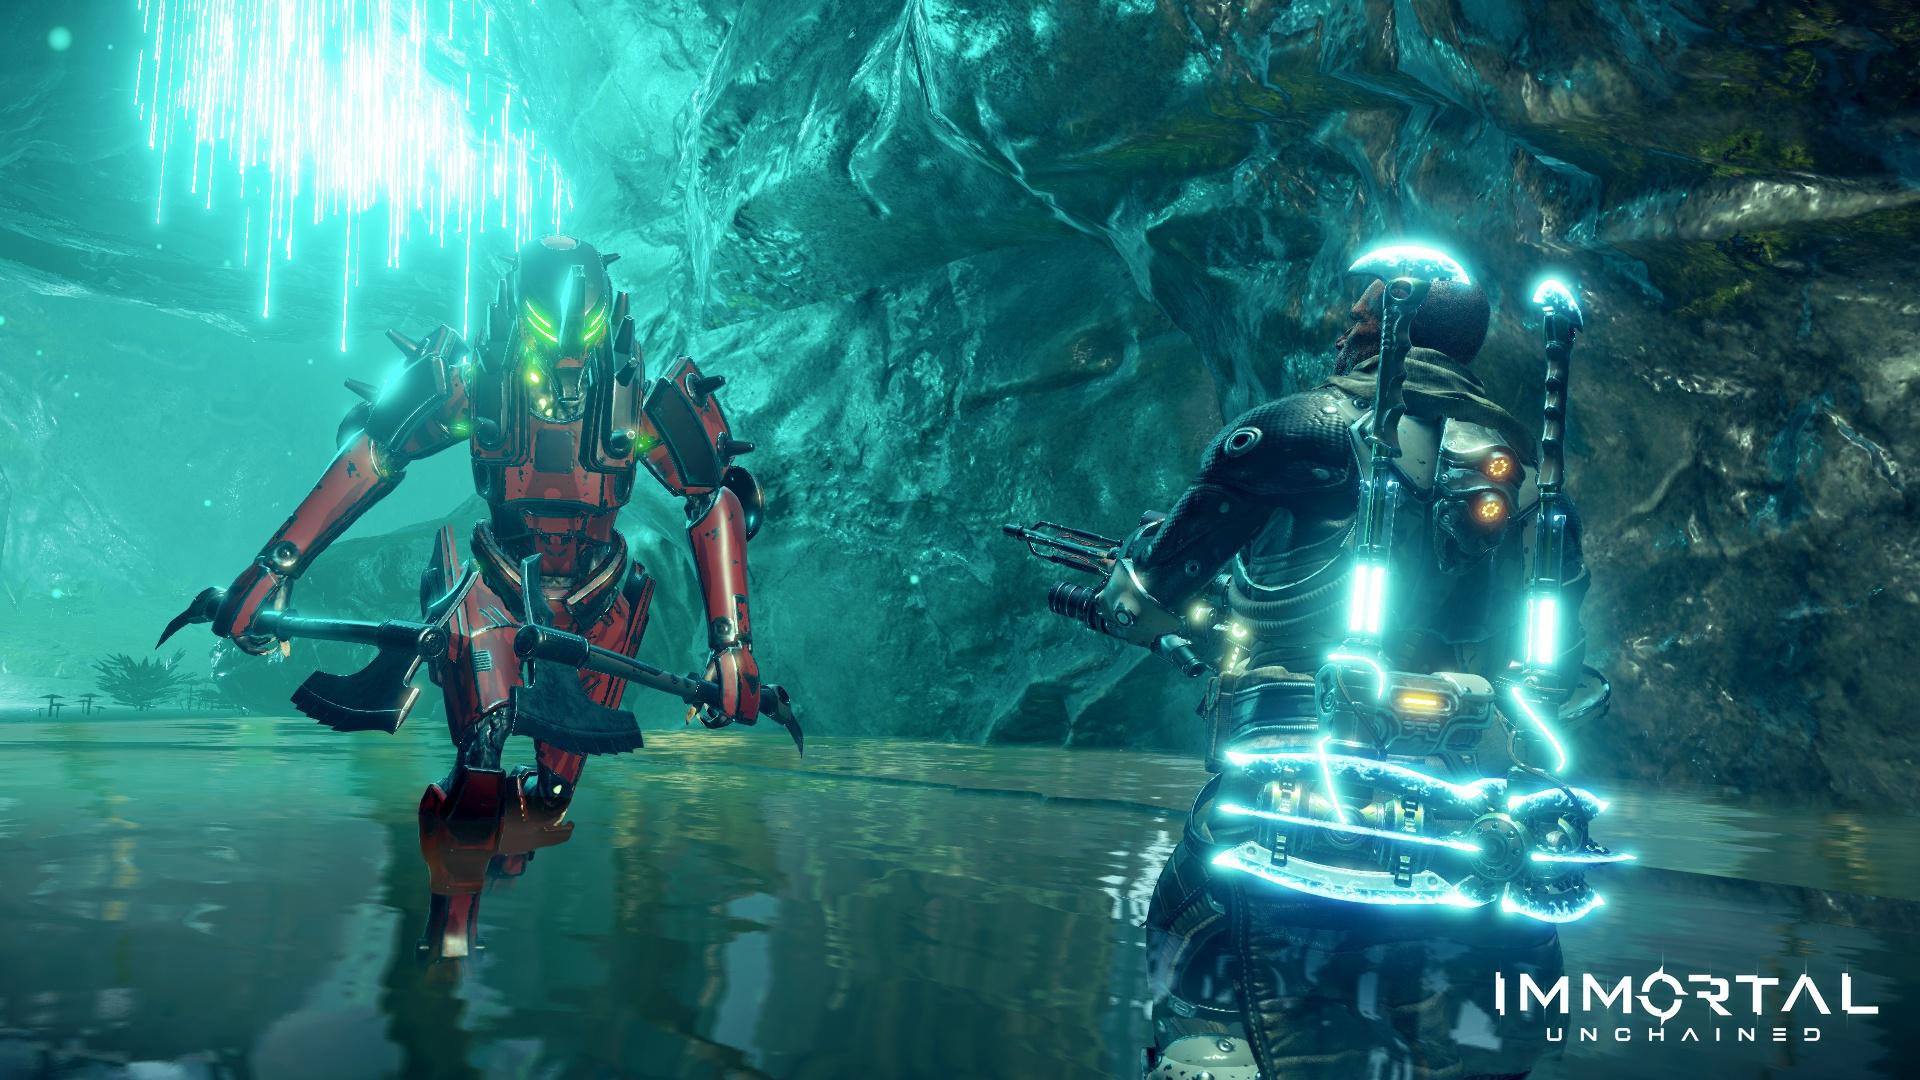 ac7d5e8 z726 - 本周XBOX游戏推荐:EA与2K的无声抗争